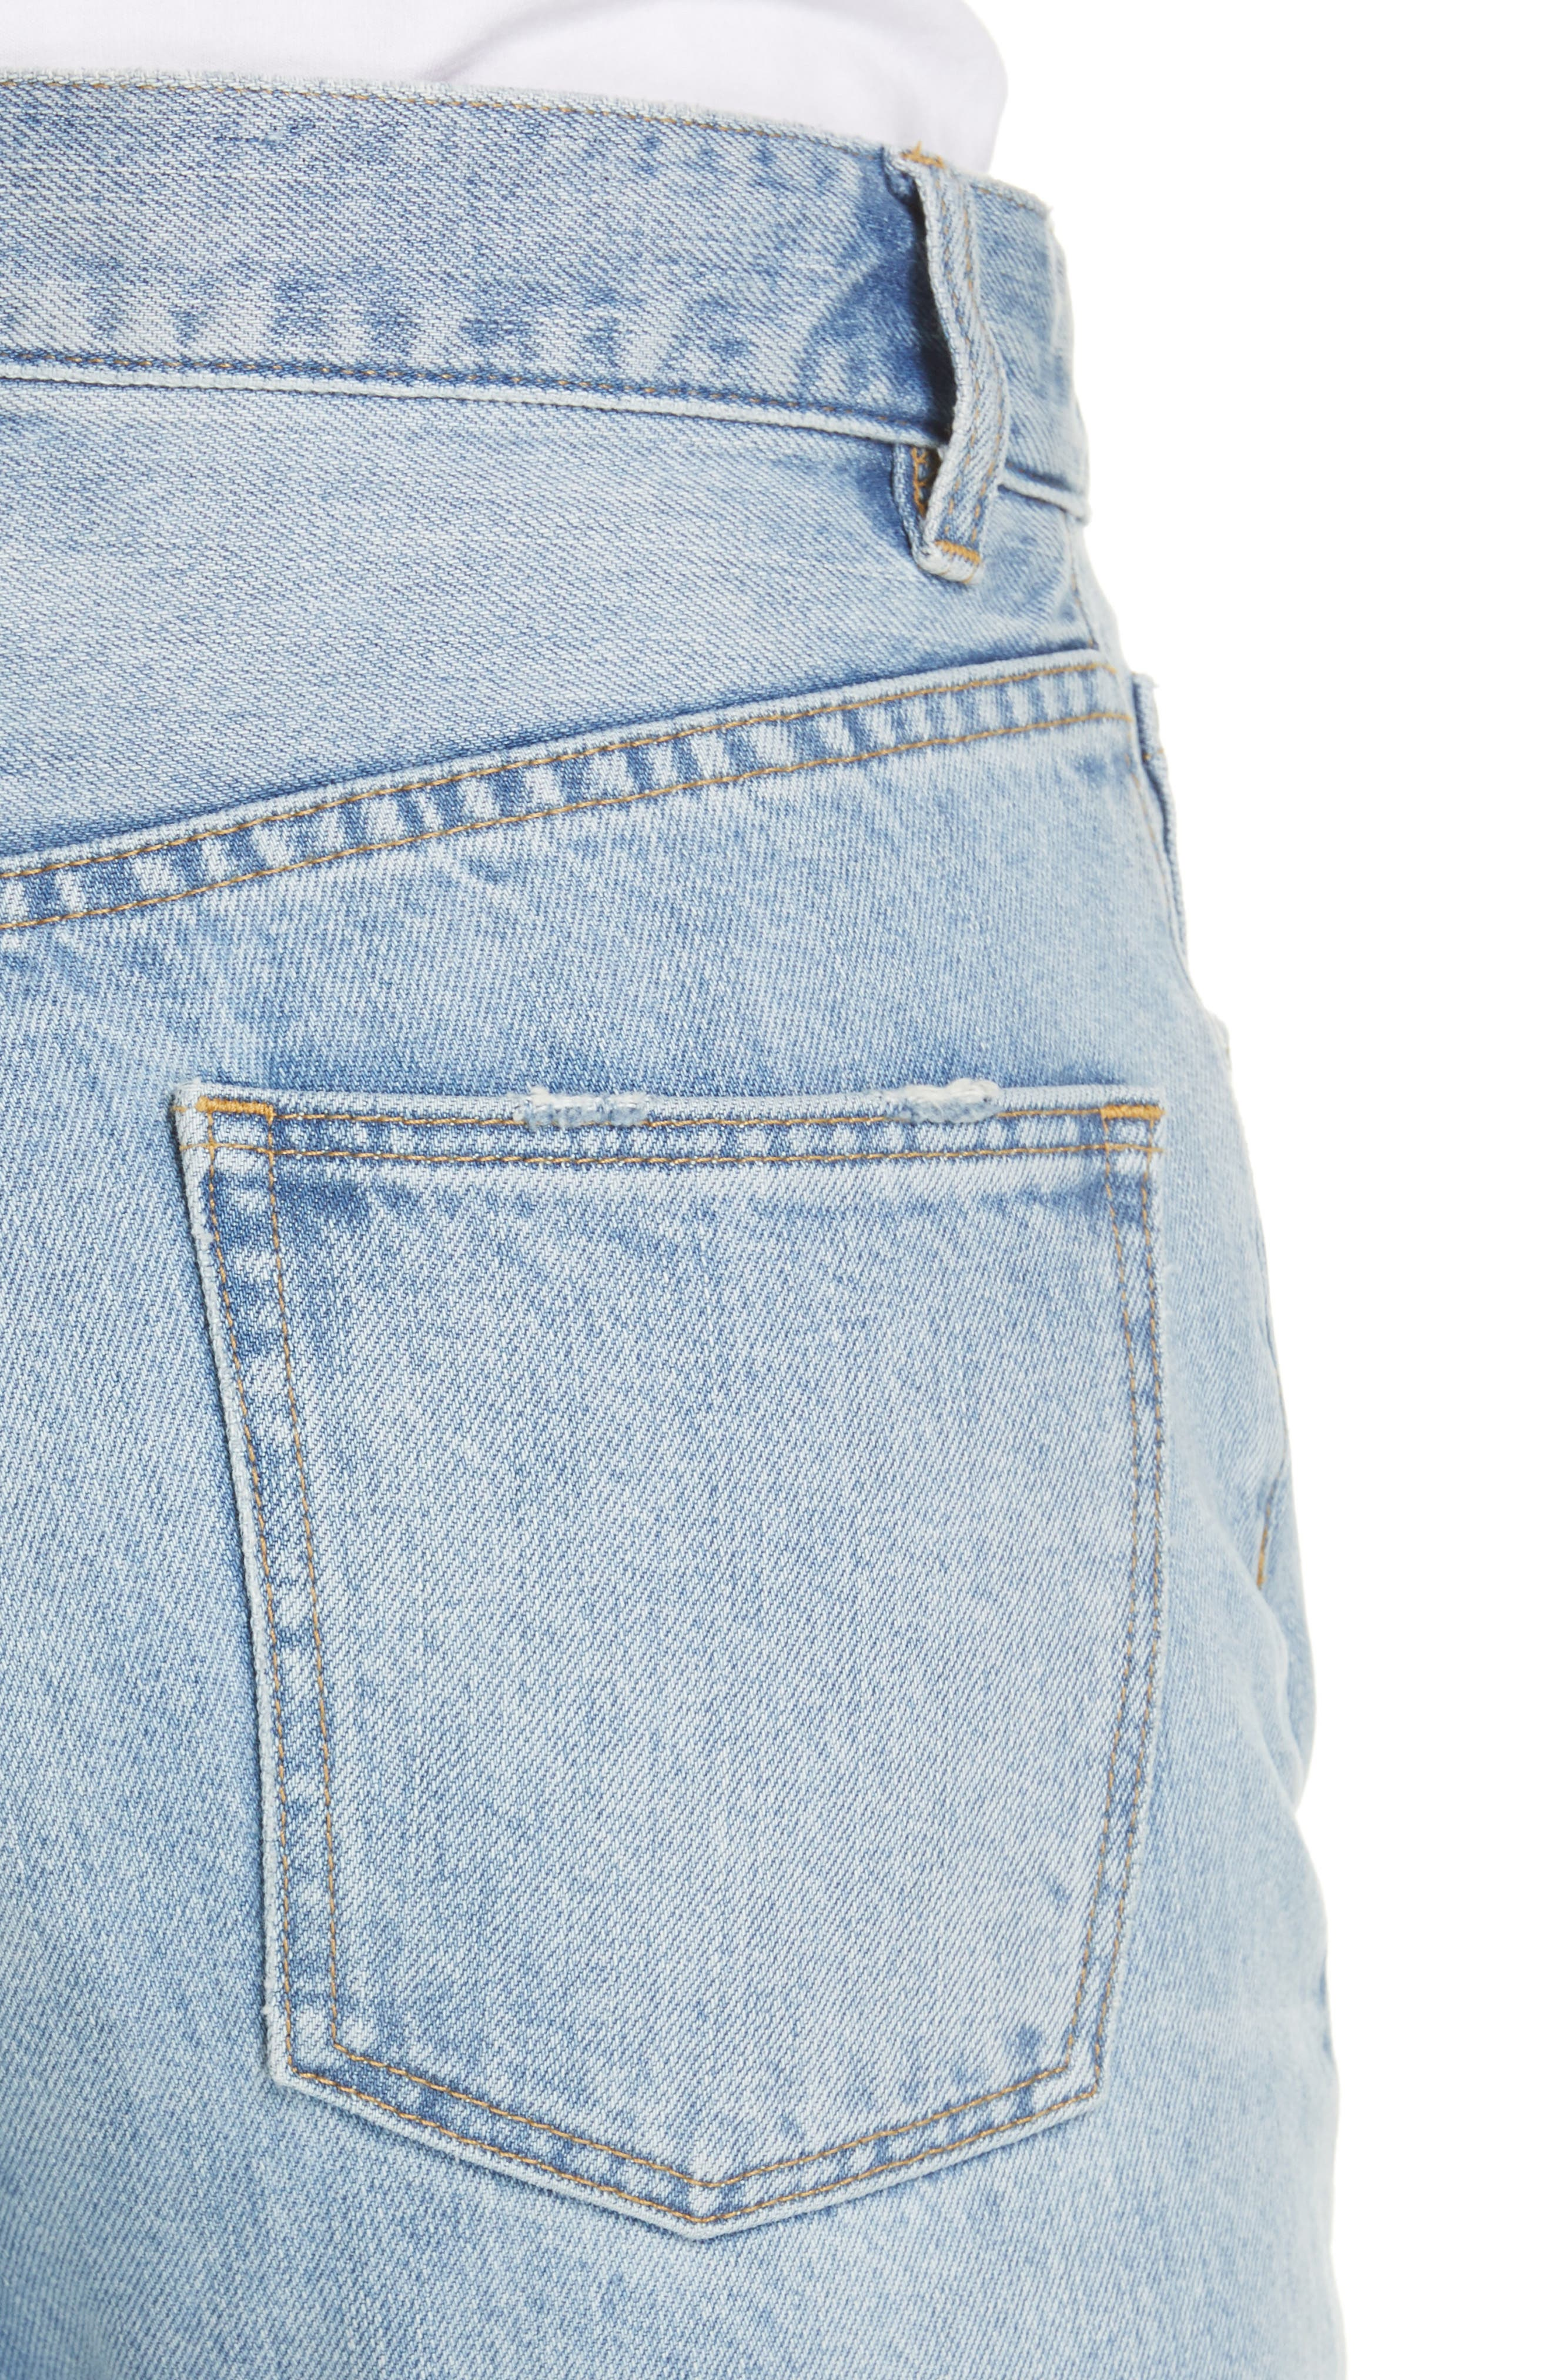 LA VIE REBECCA TAYLOR, Sylvie High Waist Jeans, Alternate thumbnail 5, color, CHANTAL WASH